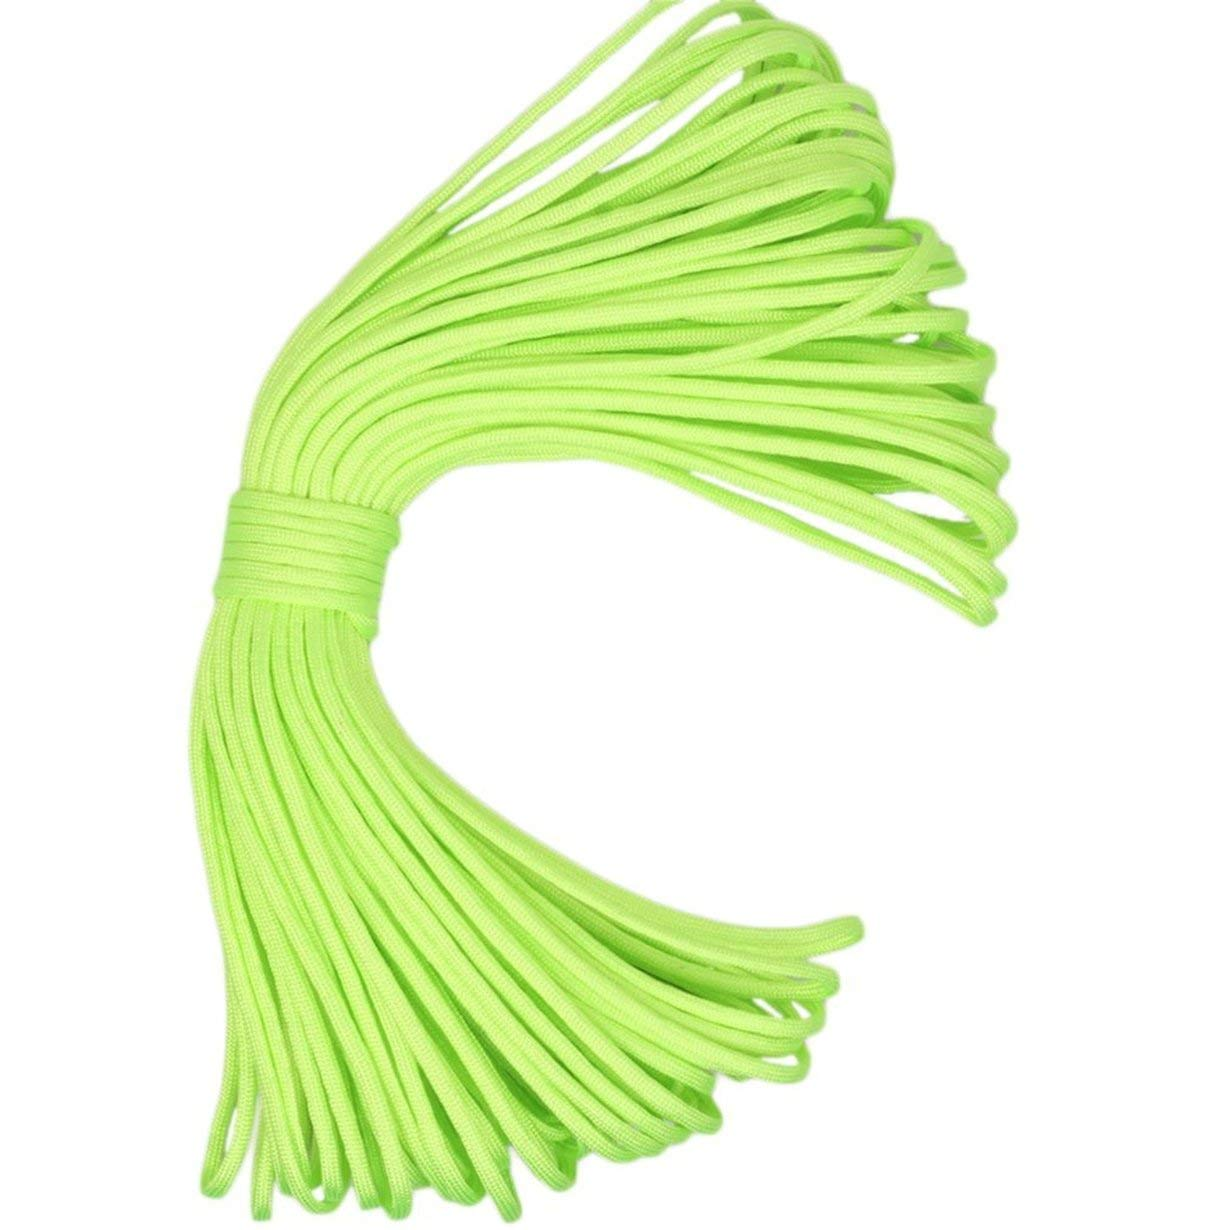 Verde Fluorescente Camellia Paracord 550 Paracord Cord/ón de paraca/ídas Cuerda de cord/ón 7 Hilos 100 pies Equipo de Supervivencia para Acampar Escalada